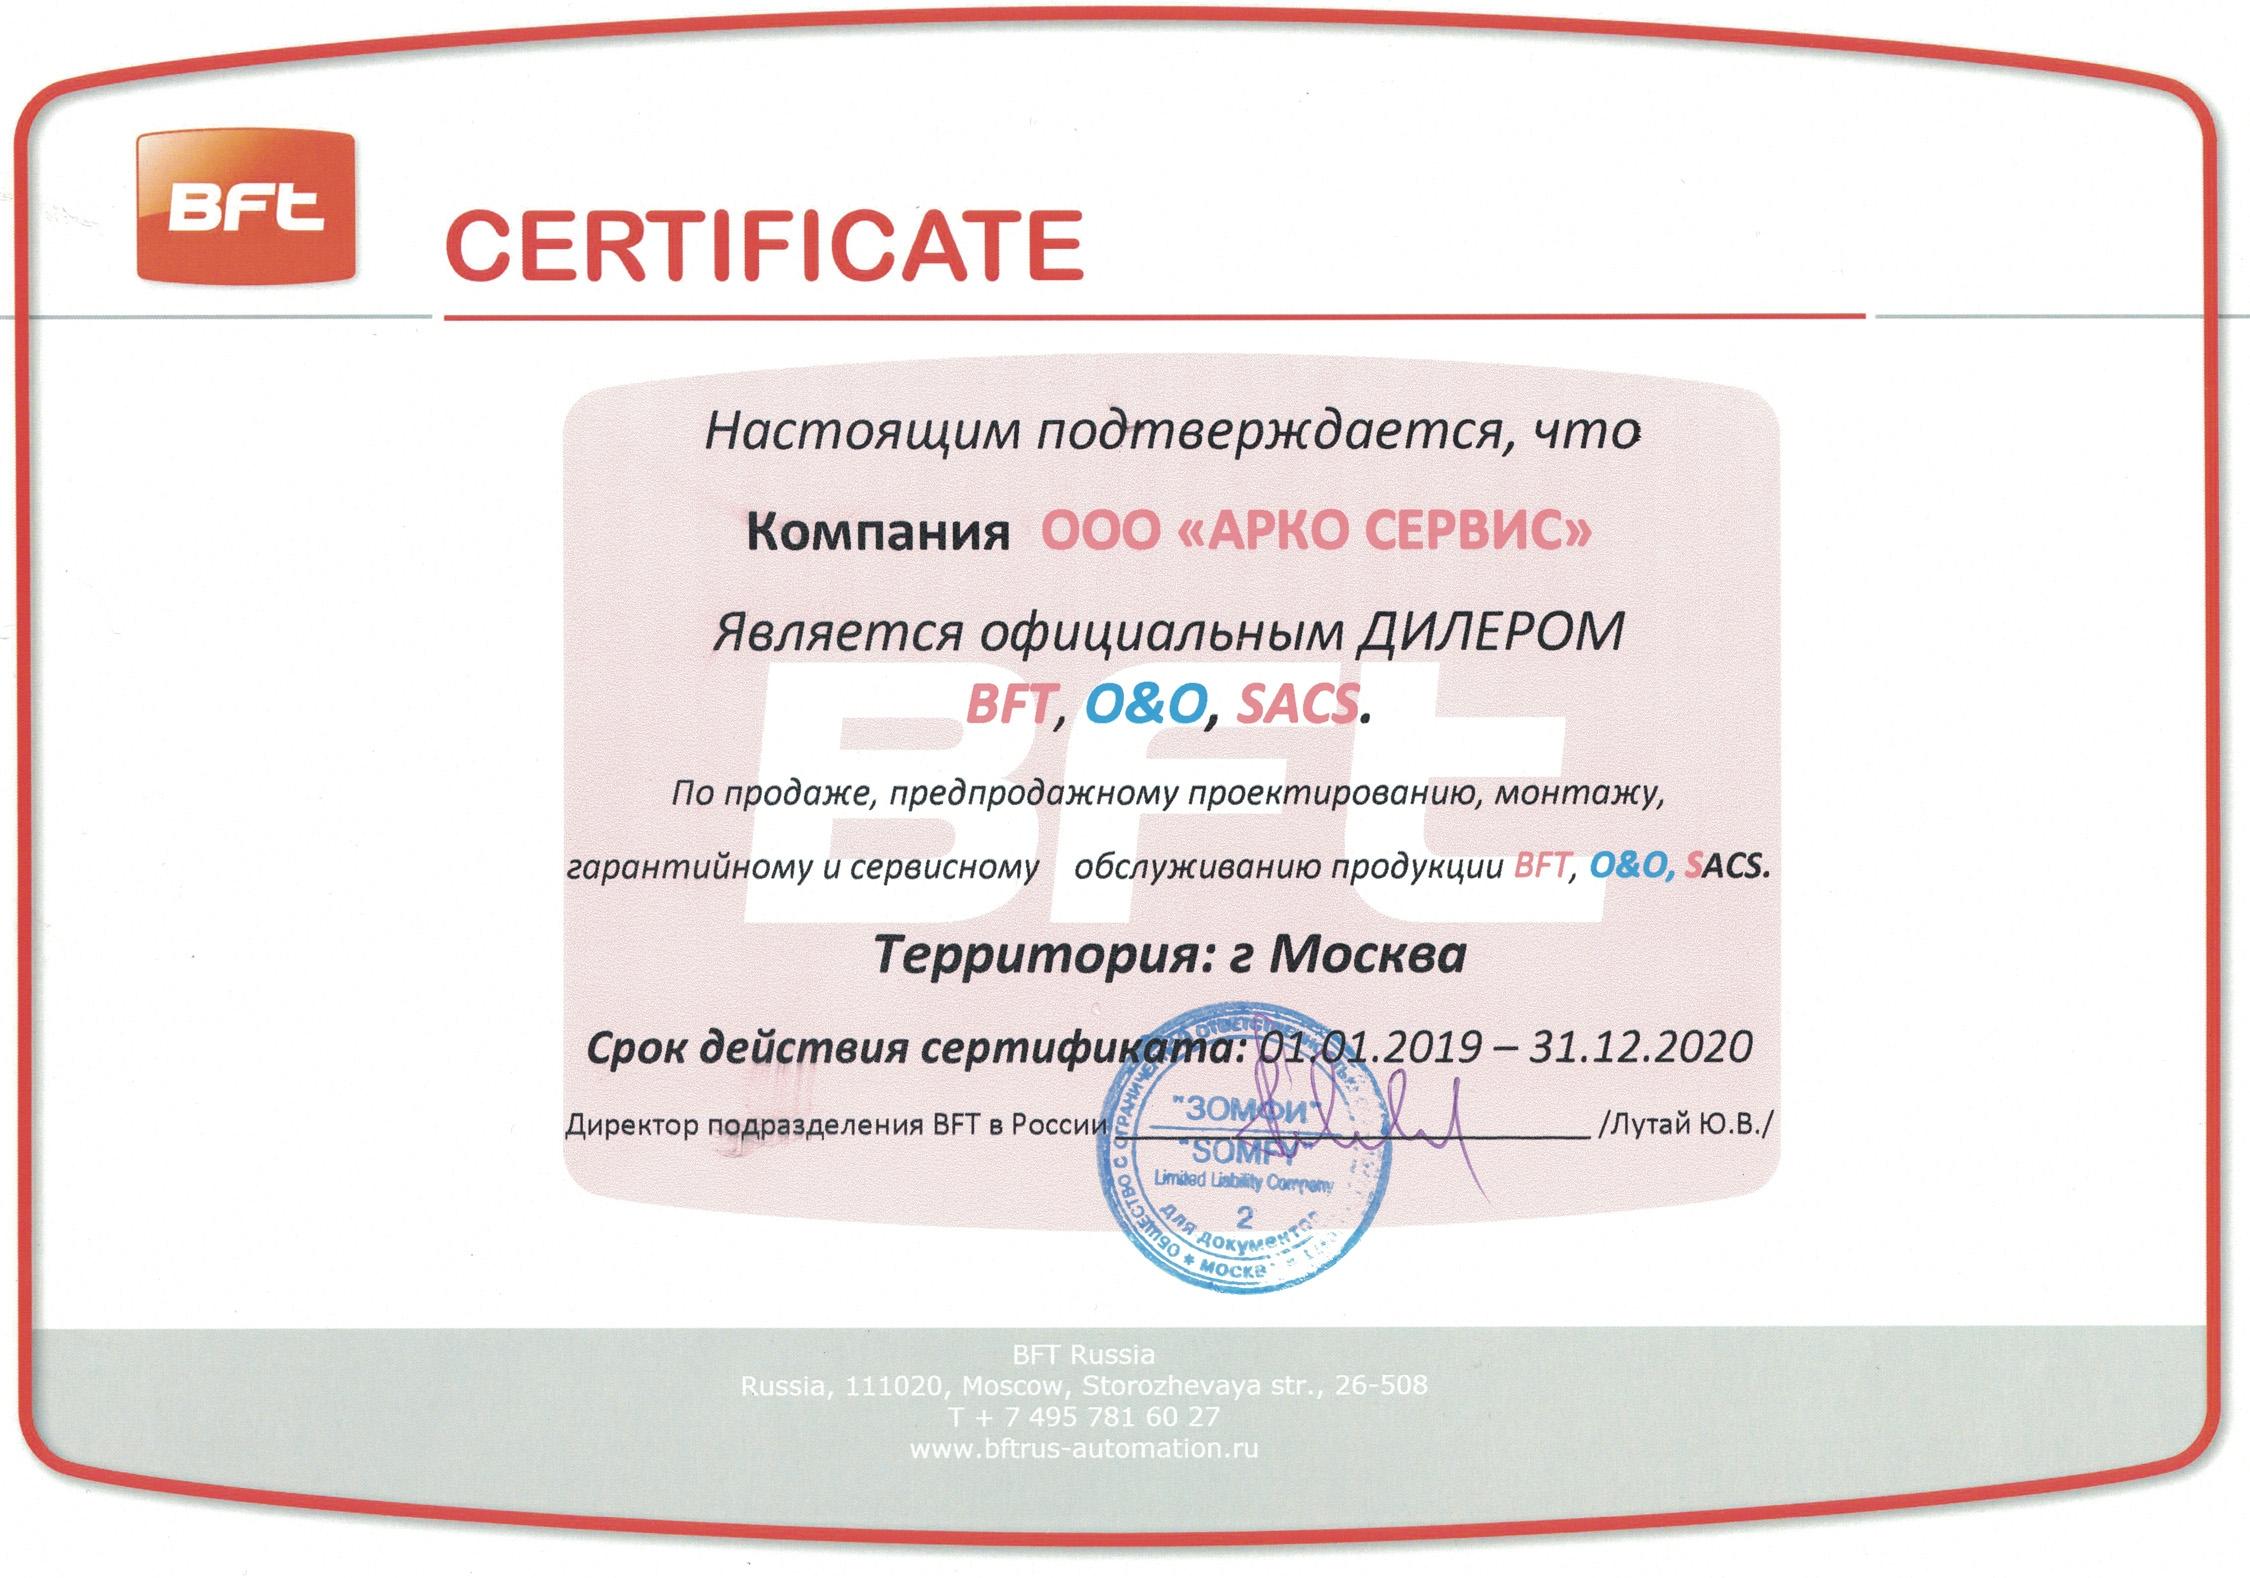 Сертификат BFT Арко Сервис